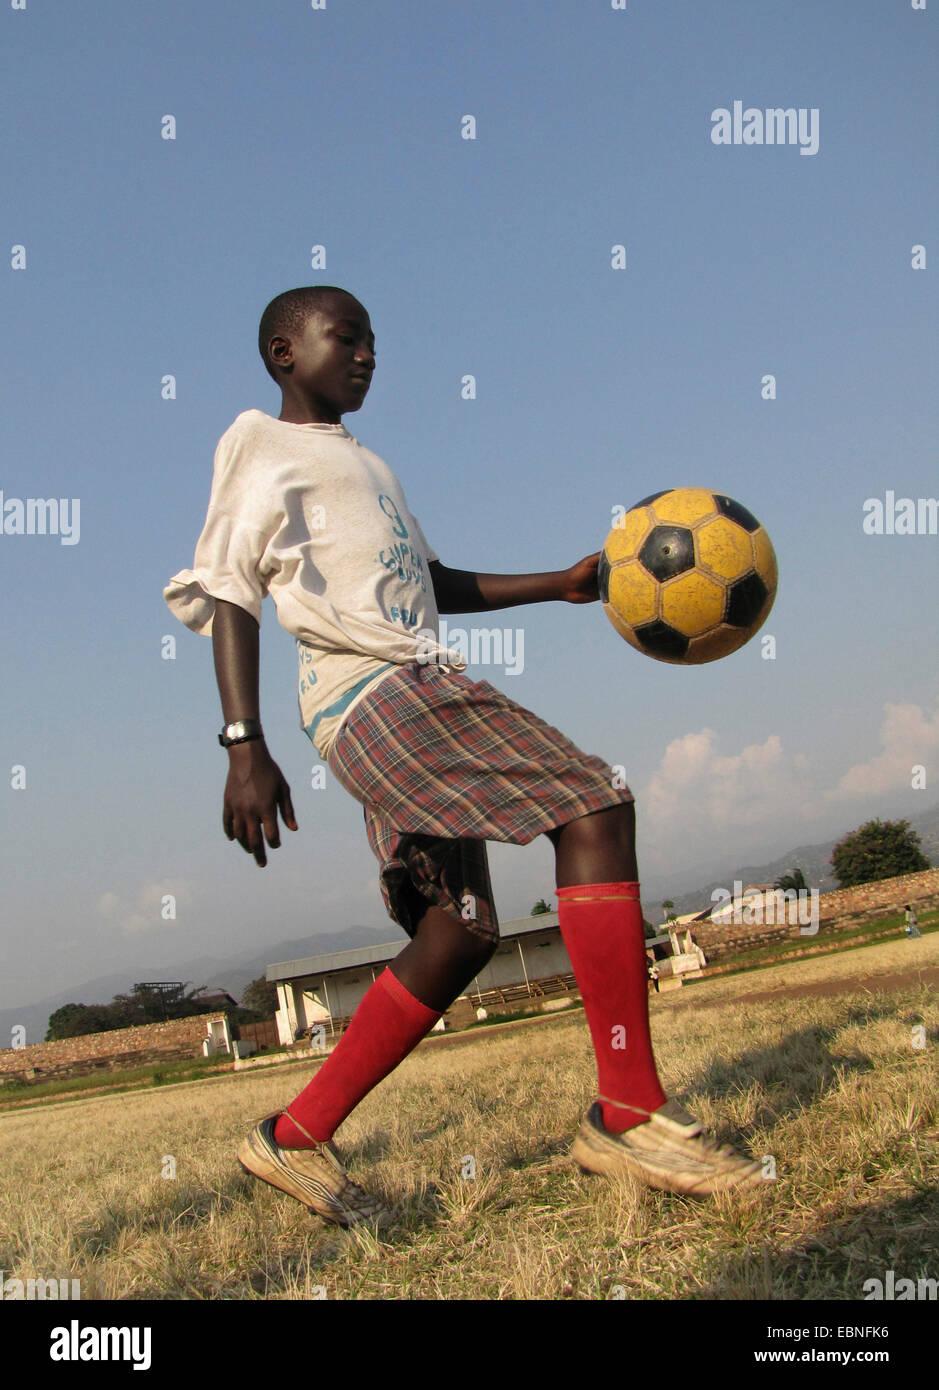 boy playing football in the city's old football stadium, Burundi, Bujumbura mairie, Bujumbura - Stock Image